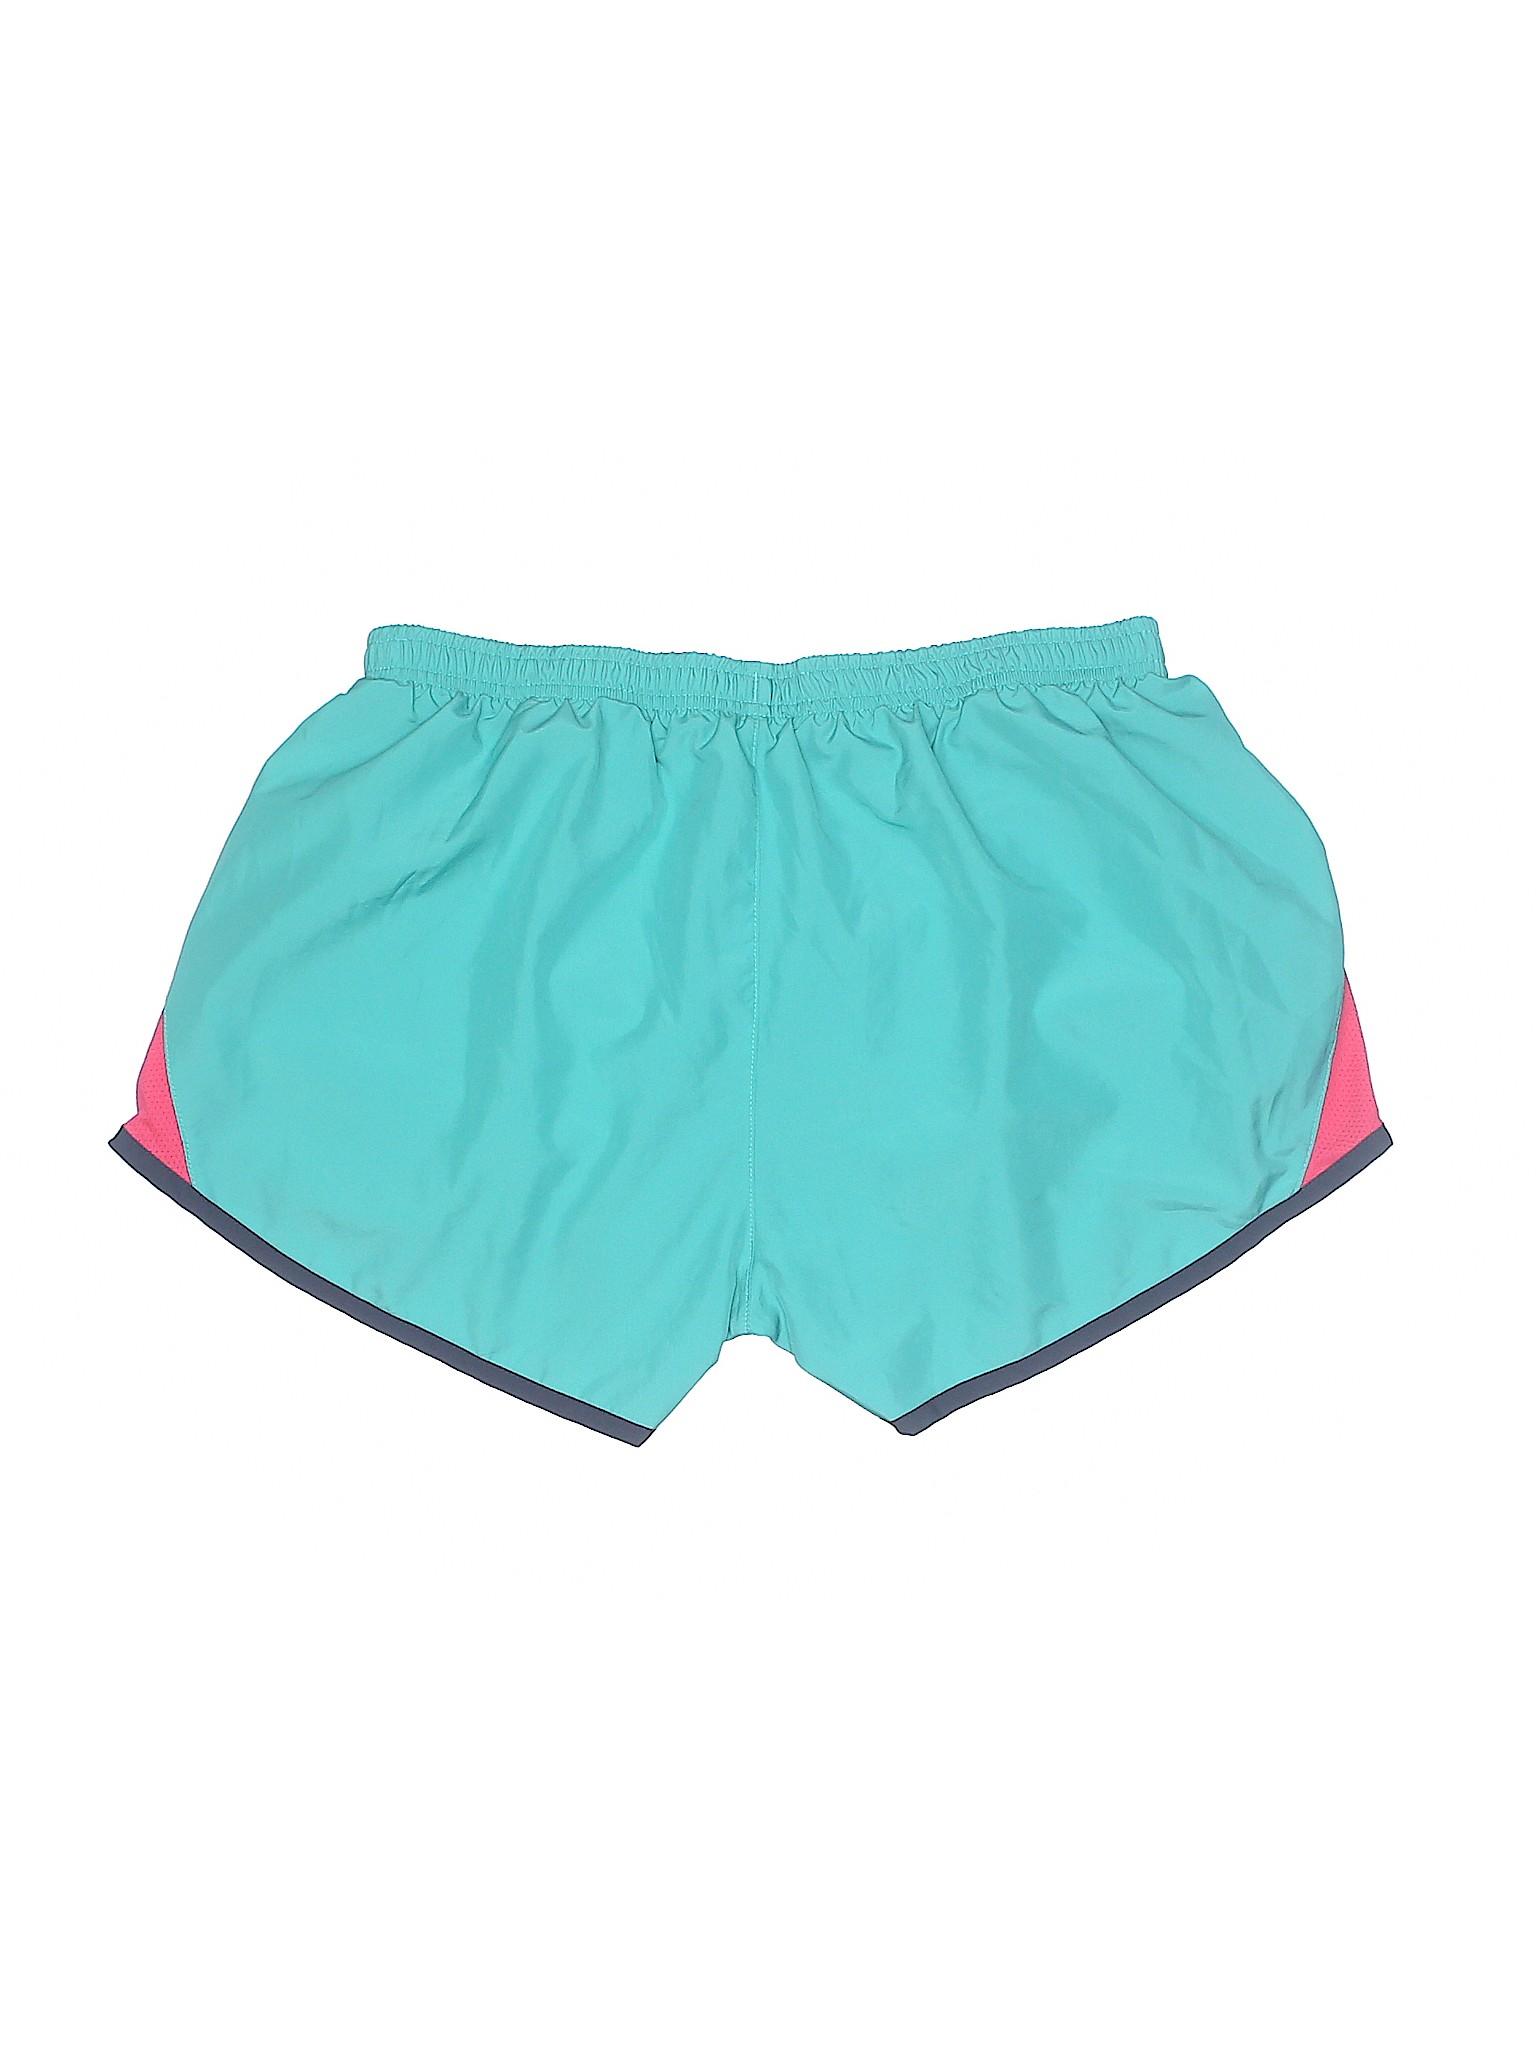 Boutique Nike Boutique Shorts Nike Athletic BxX1vq